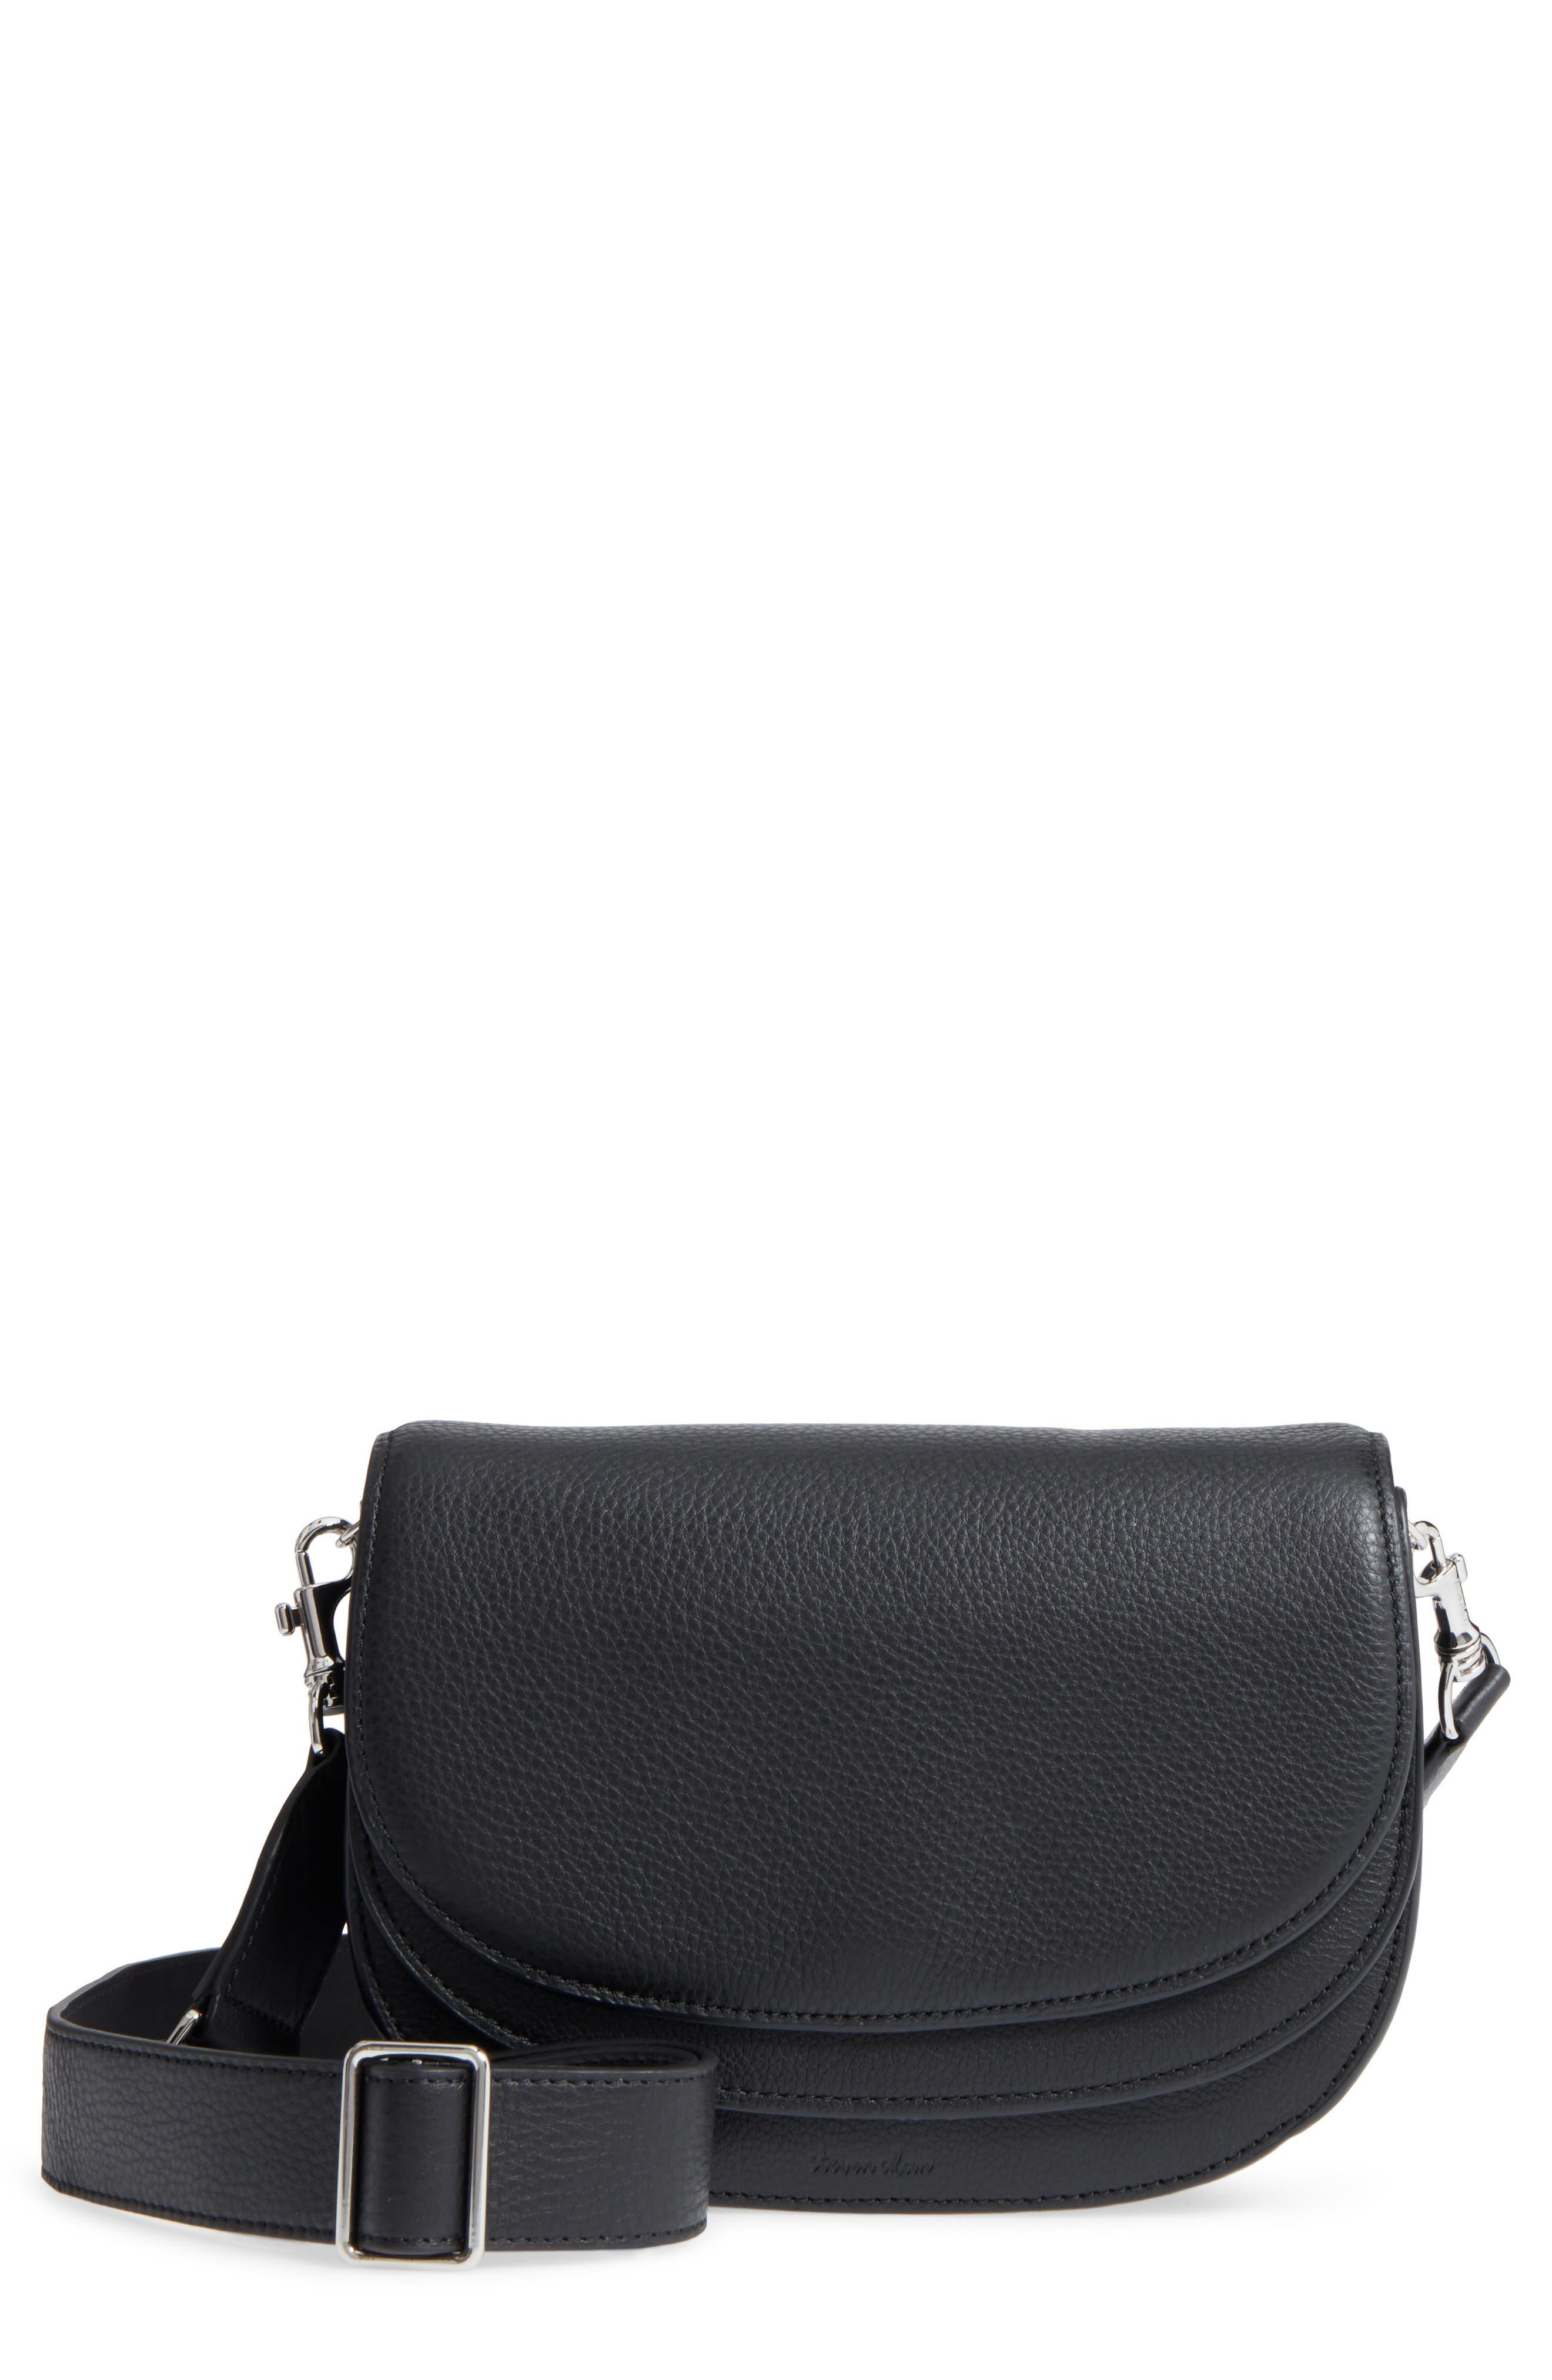 Landon Leather Crossbody Saddle Bag,                             Main thumbnail 1, color,